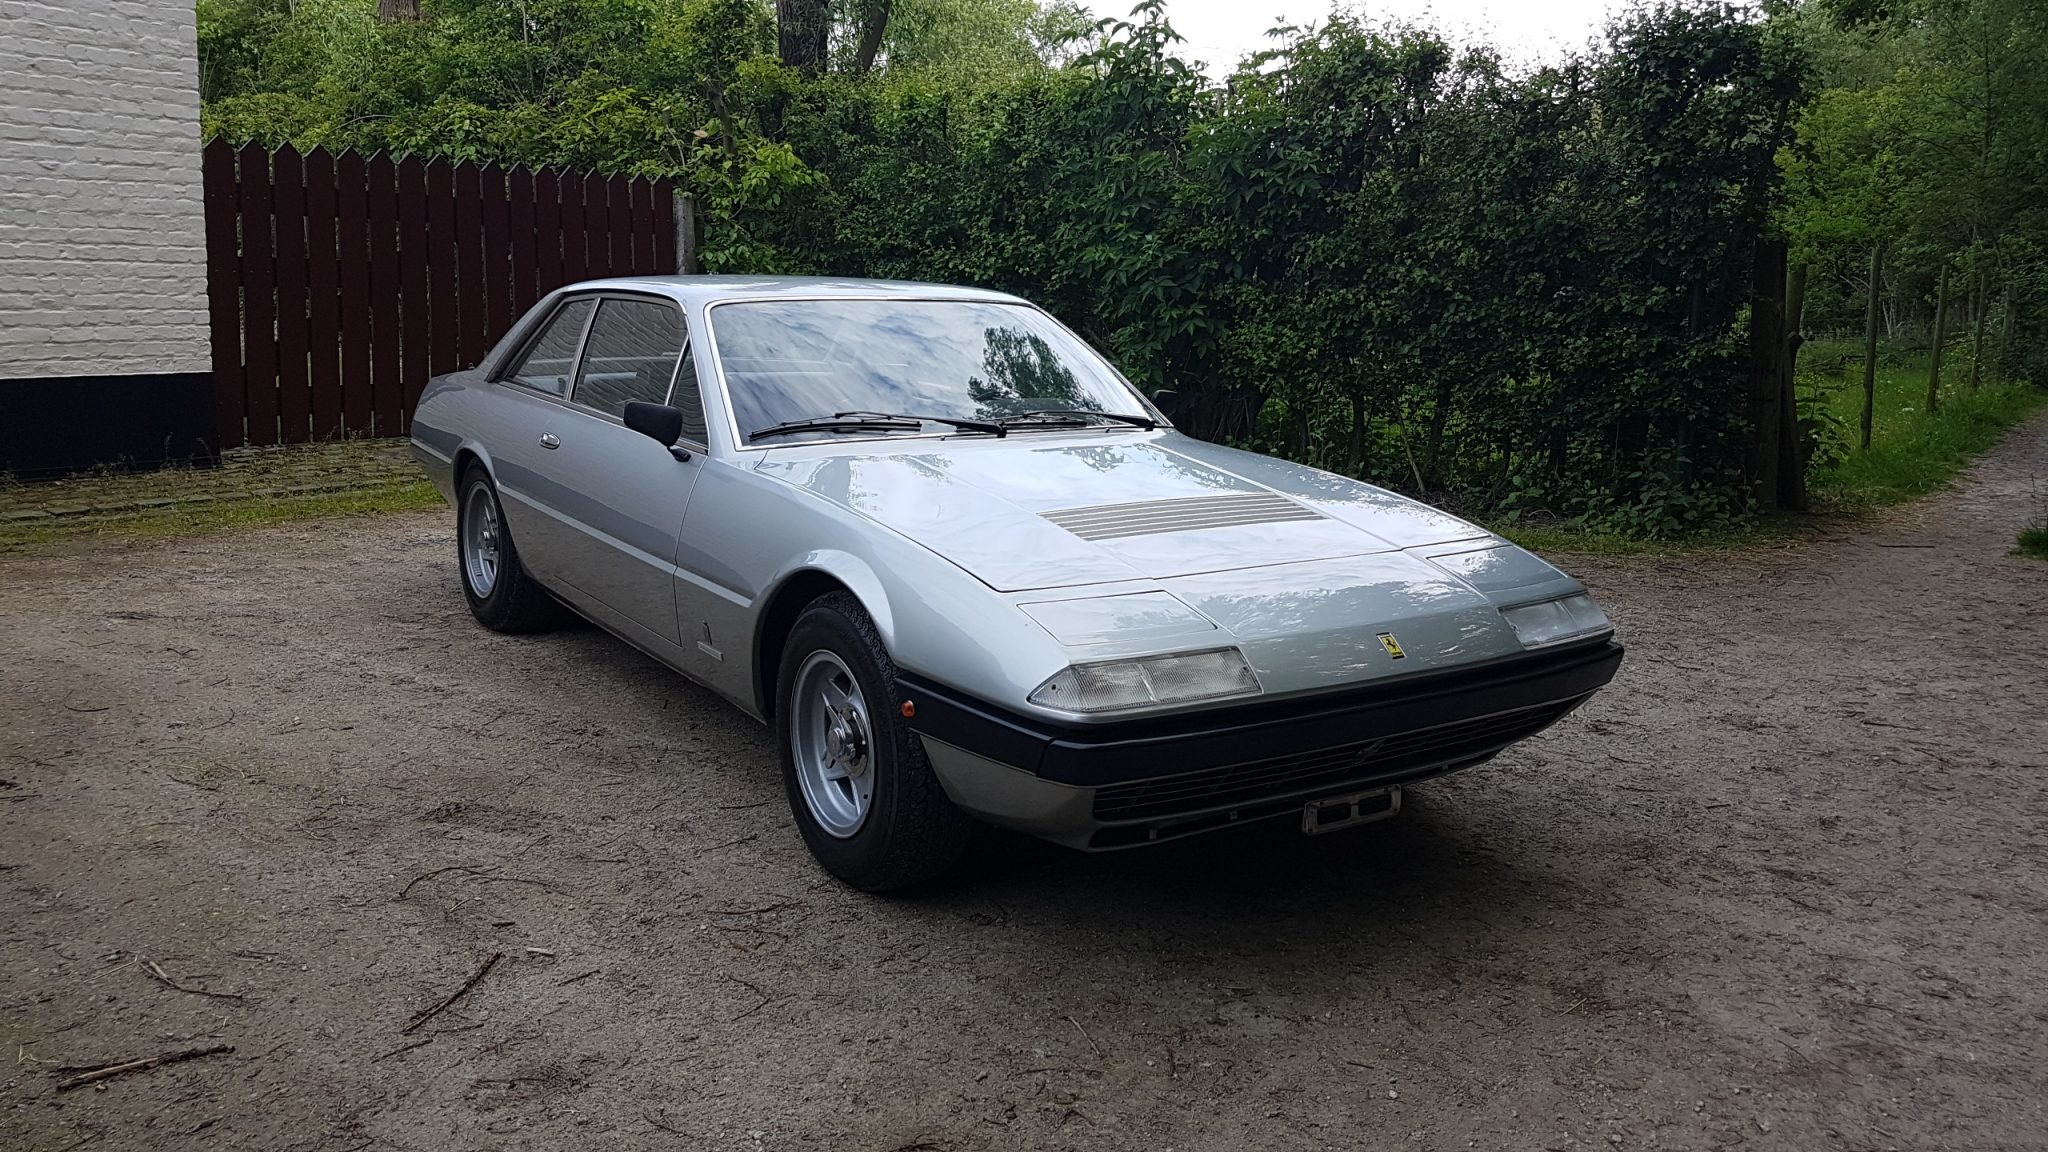 1975 Ferrari 365 GT4 2+2 For Sale (picture 1 of 6)